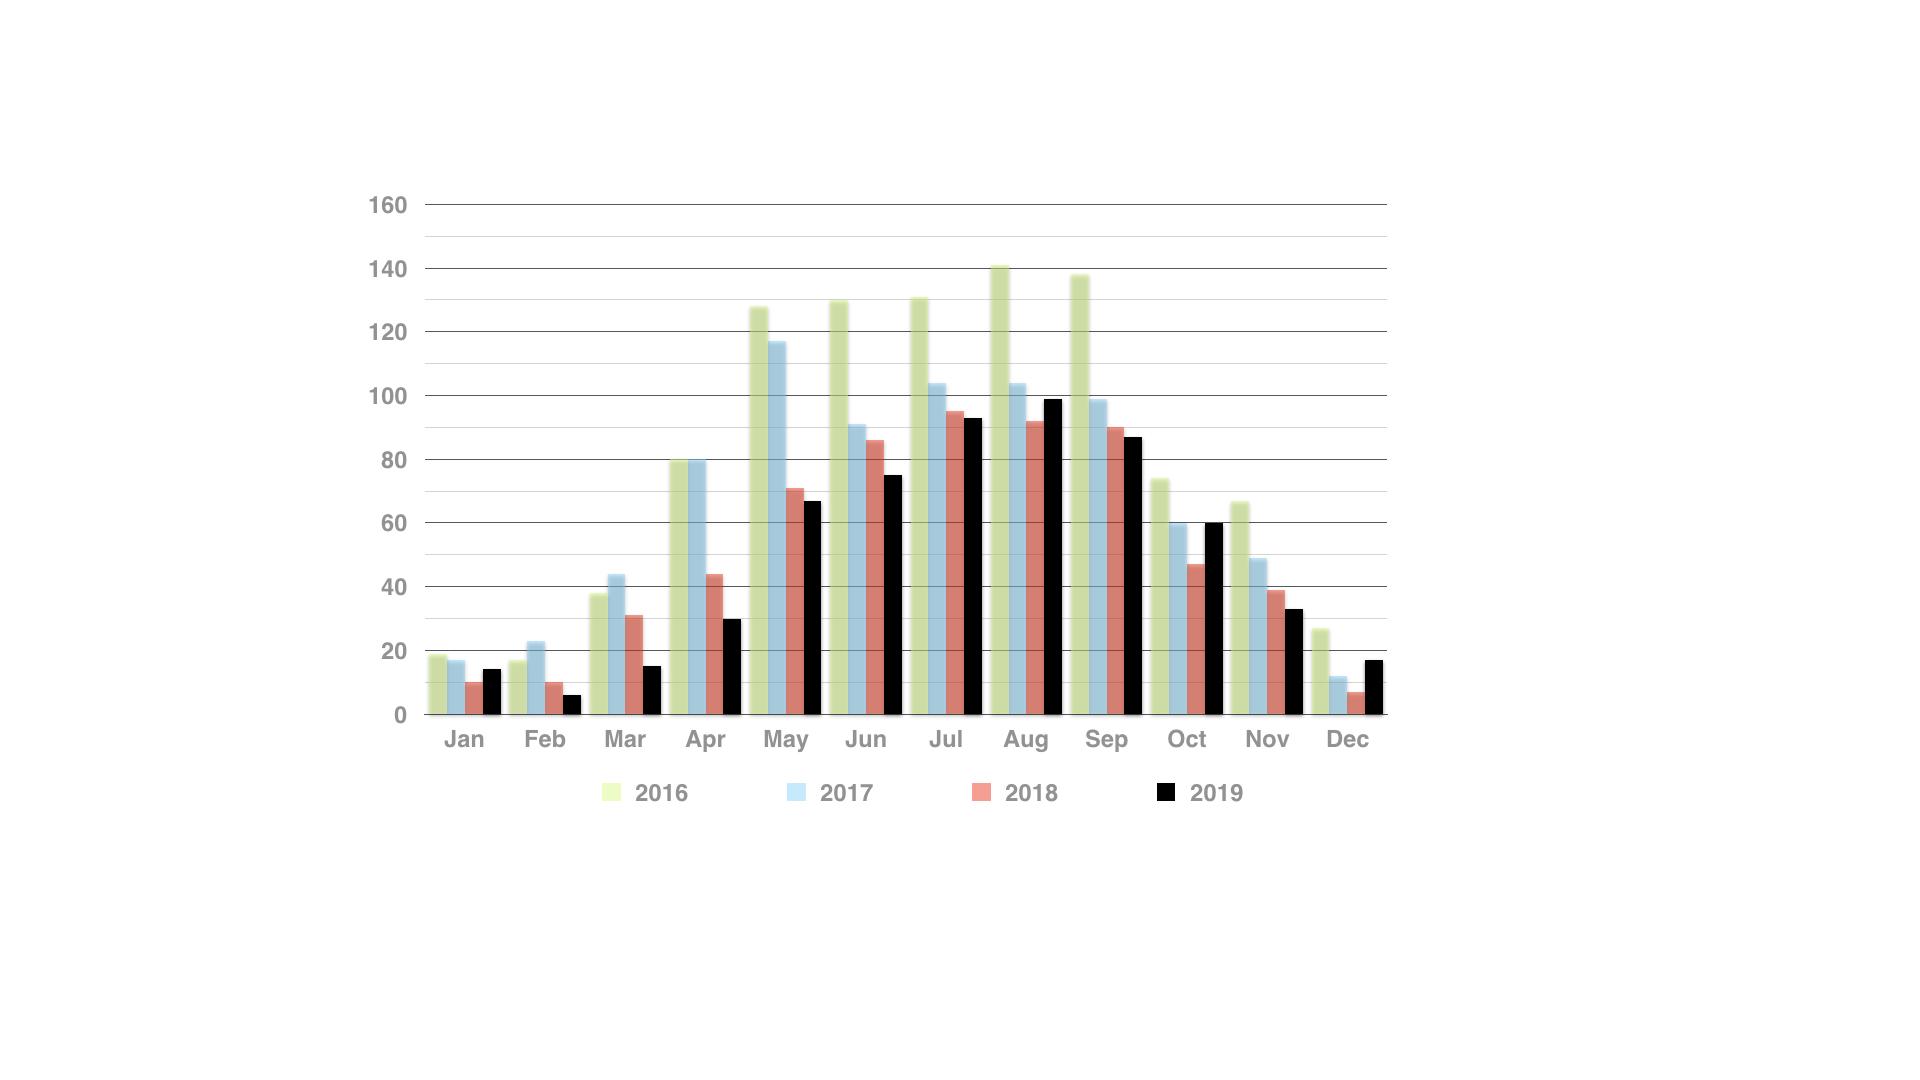 muskoka-cottage-real-estate-unit-sales-by-month